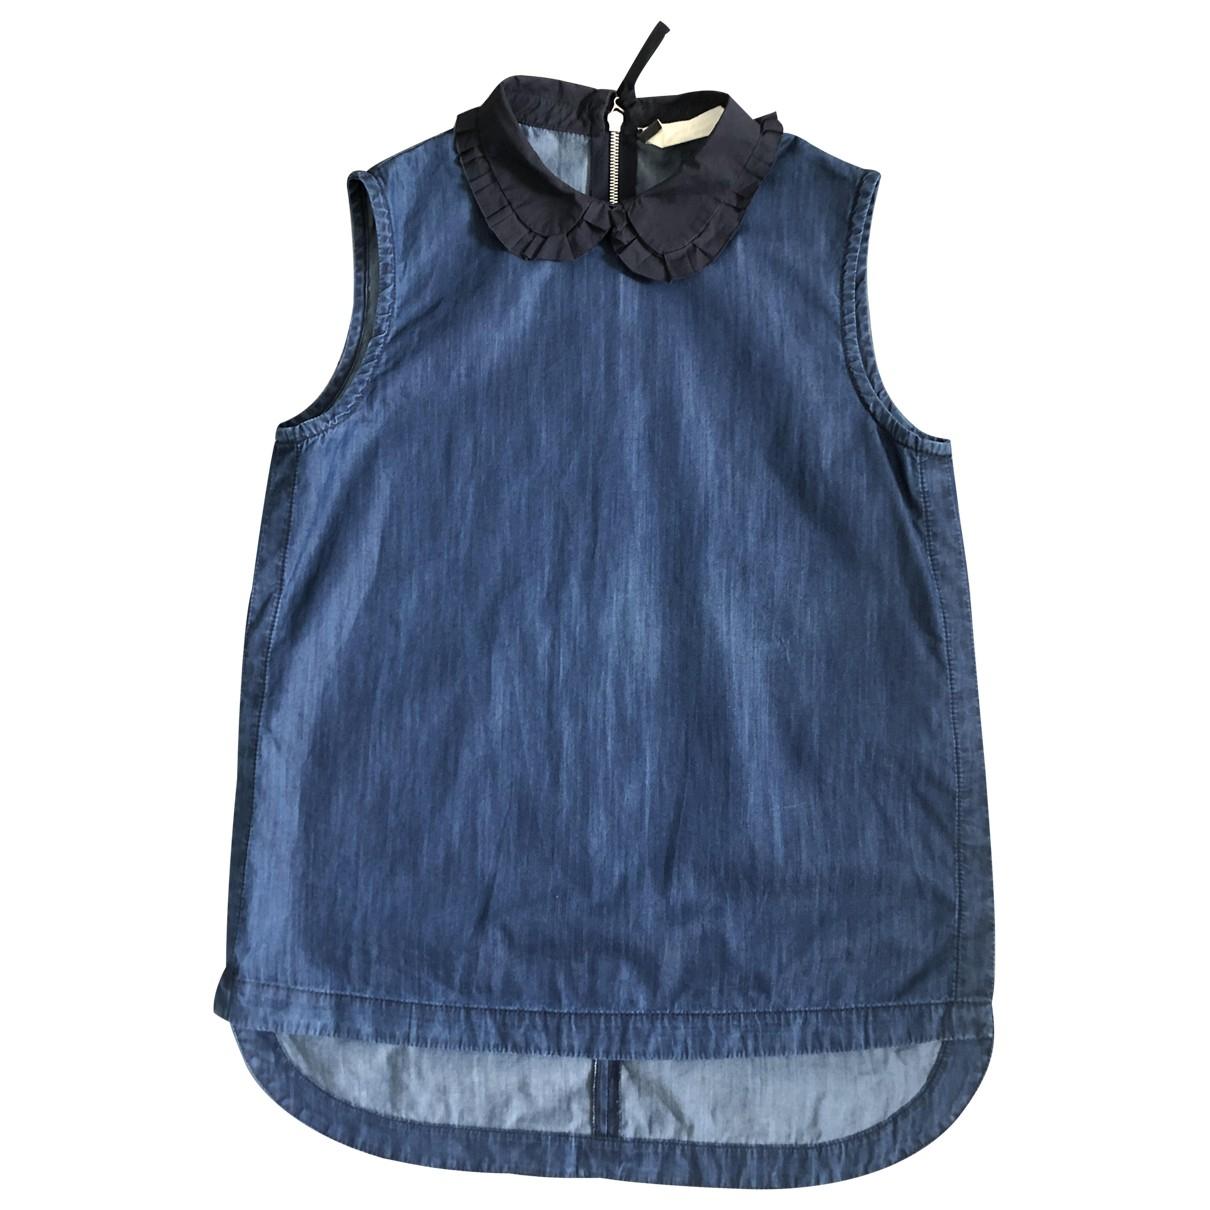 Marni - Top   pour femme en denim - bleu